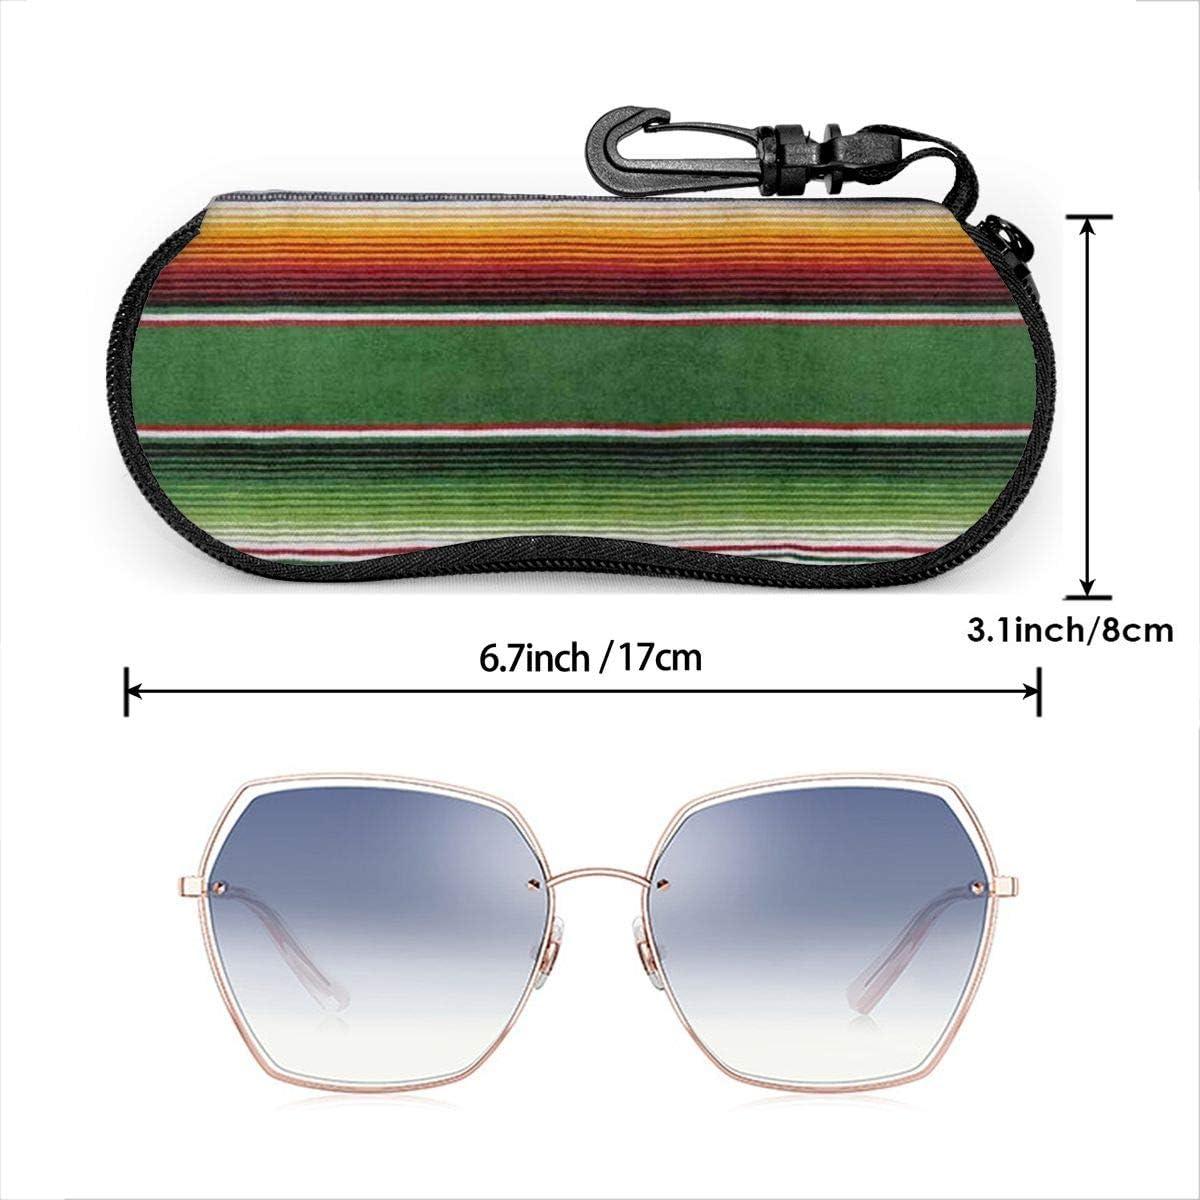 Mexican Blanket Sunglasses Soft Case Ultra Light Neoprene Zipper Eyeglass Case With Key Chain